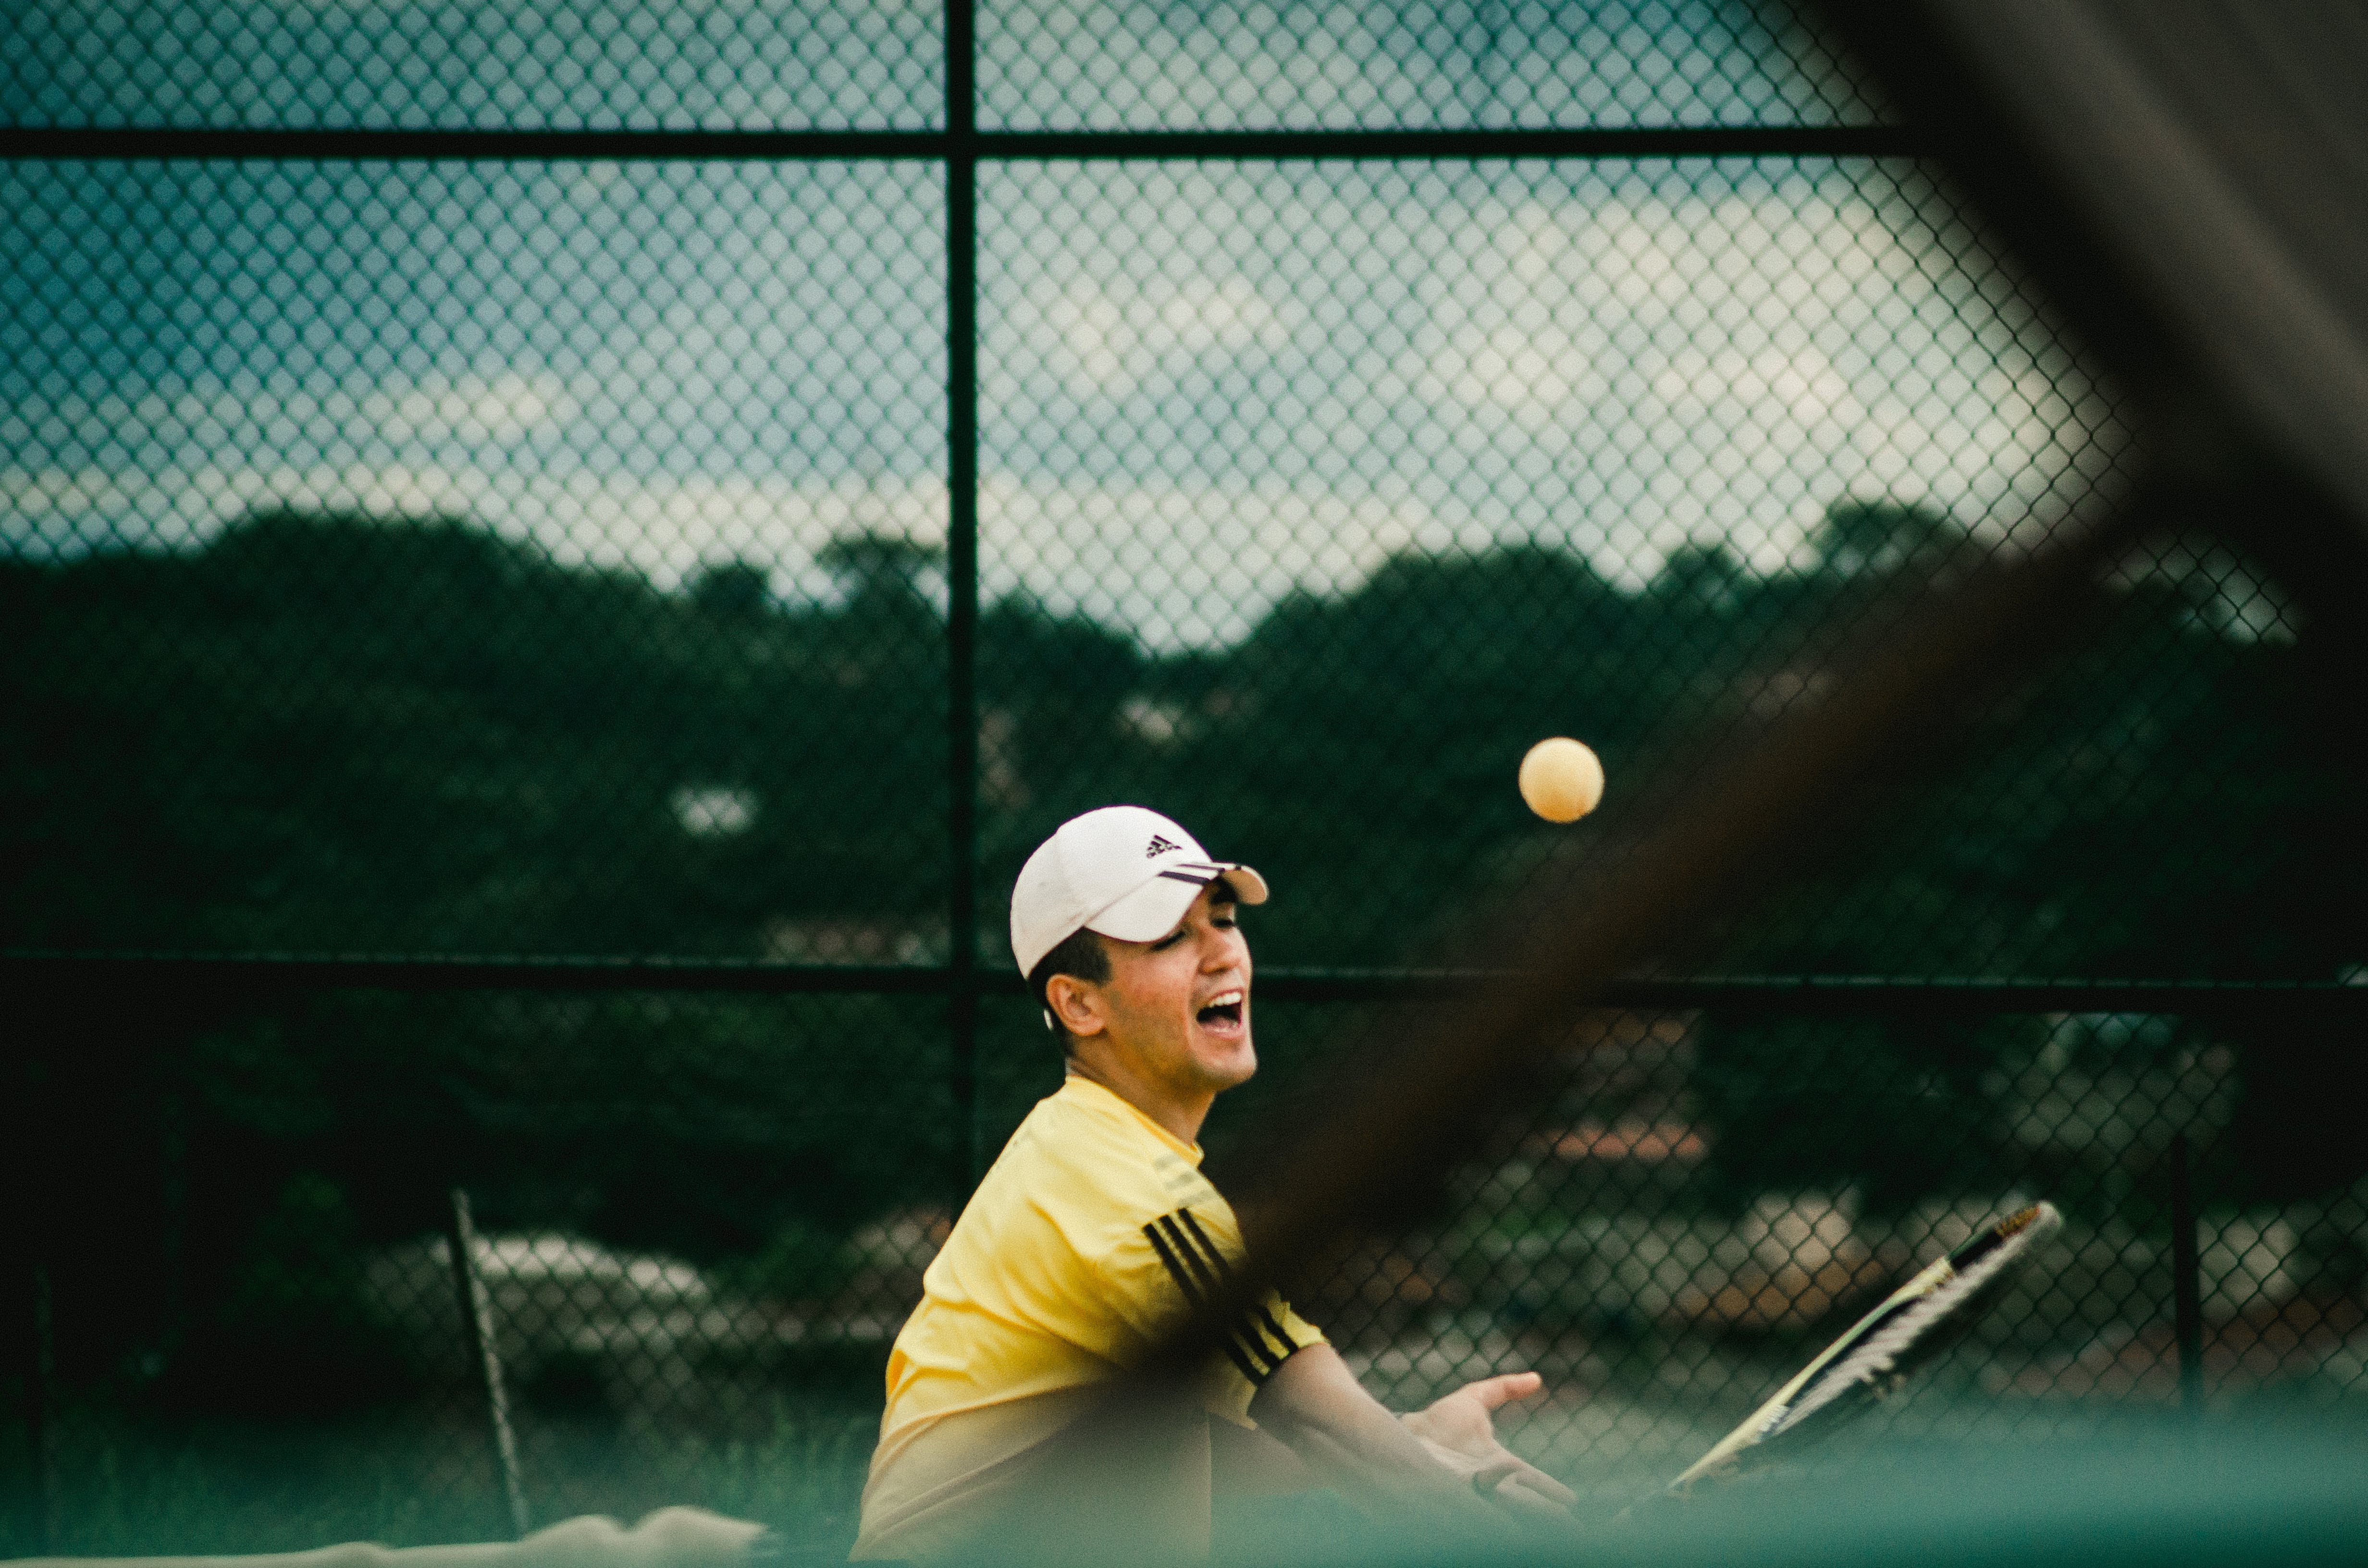 Fotos de stock gratuitas de acción, adulto, atleta, bola